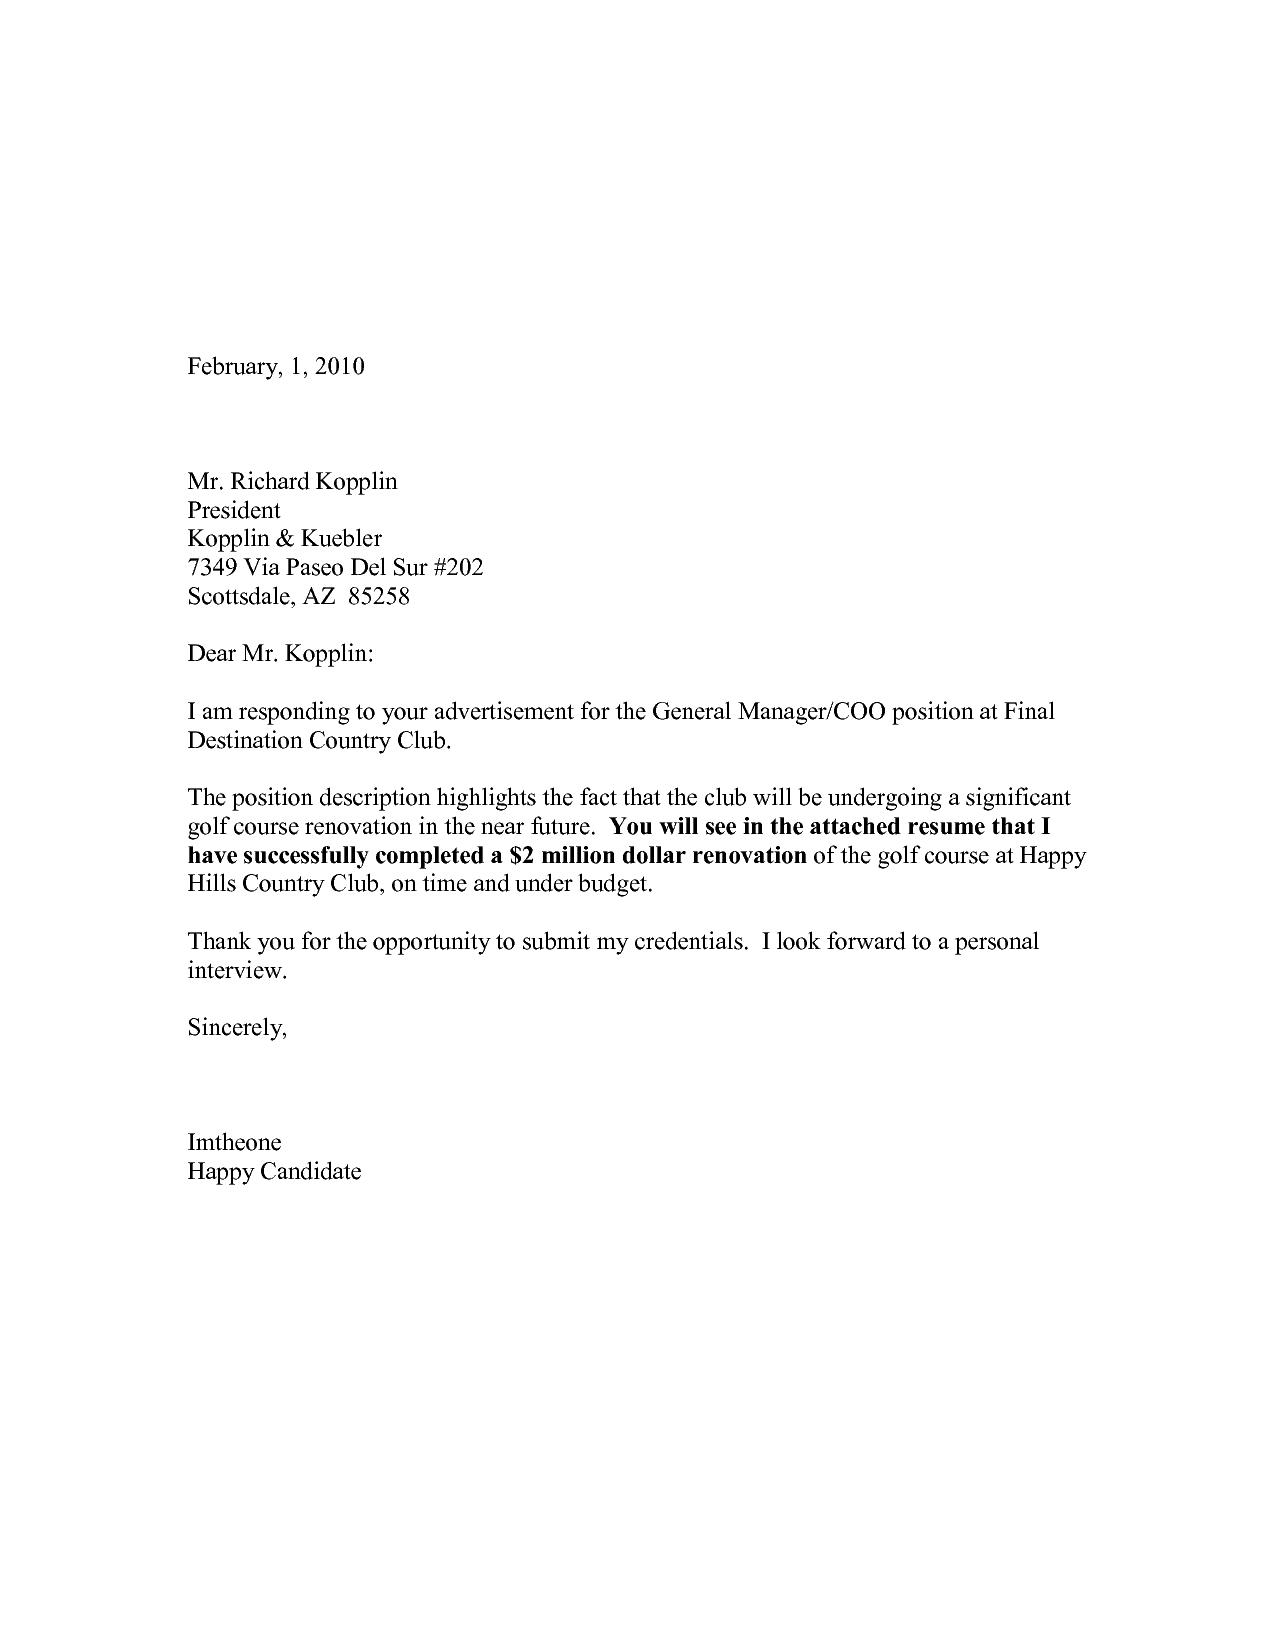 resume cover letter samples - Resume Cover Letters Samples